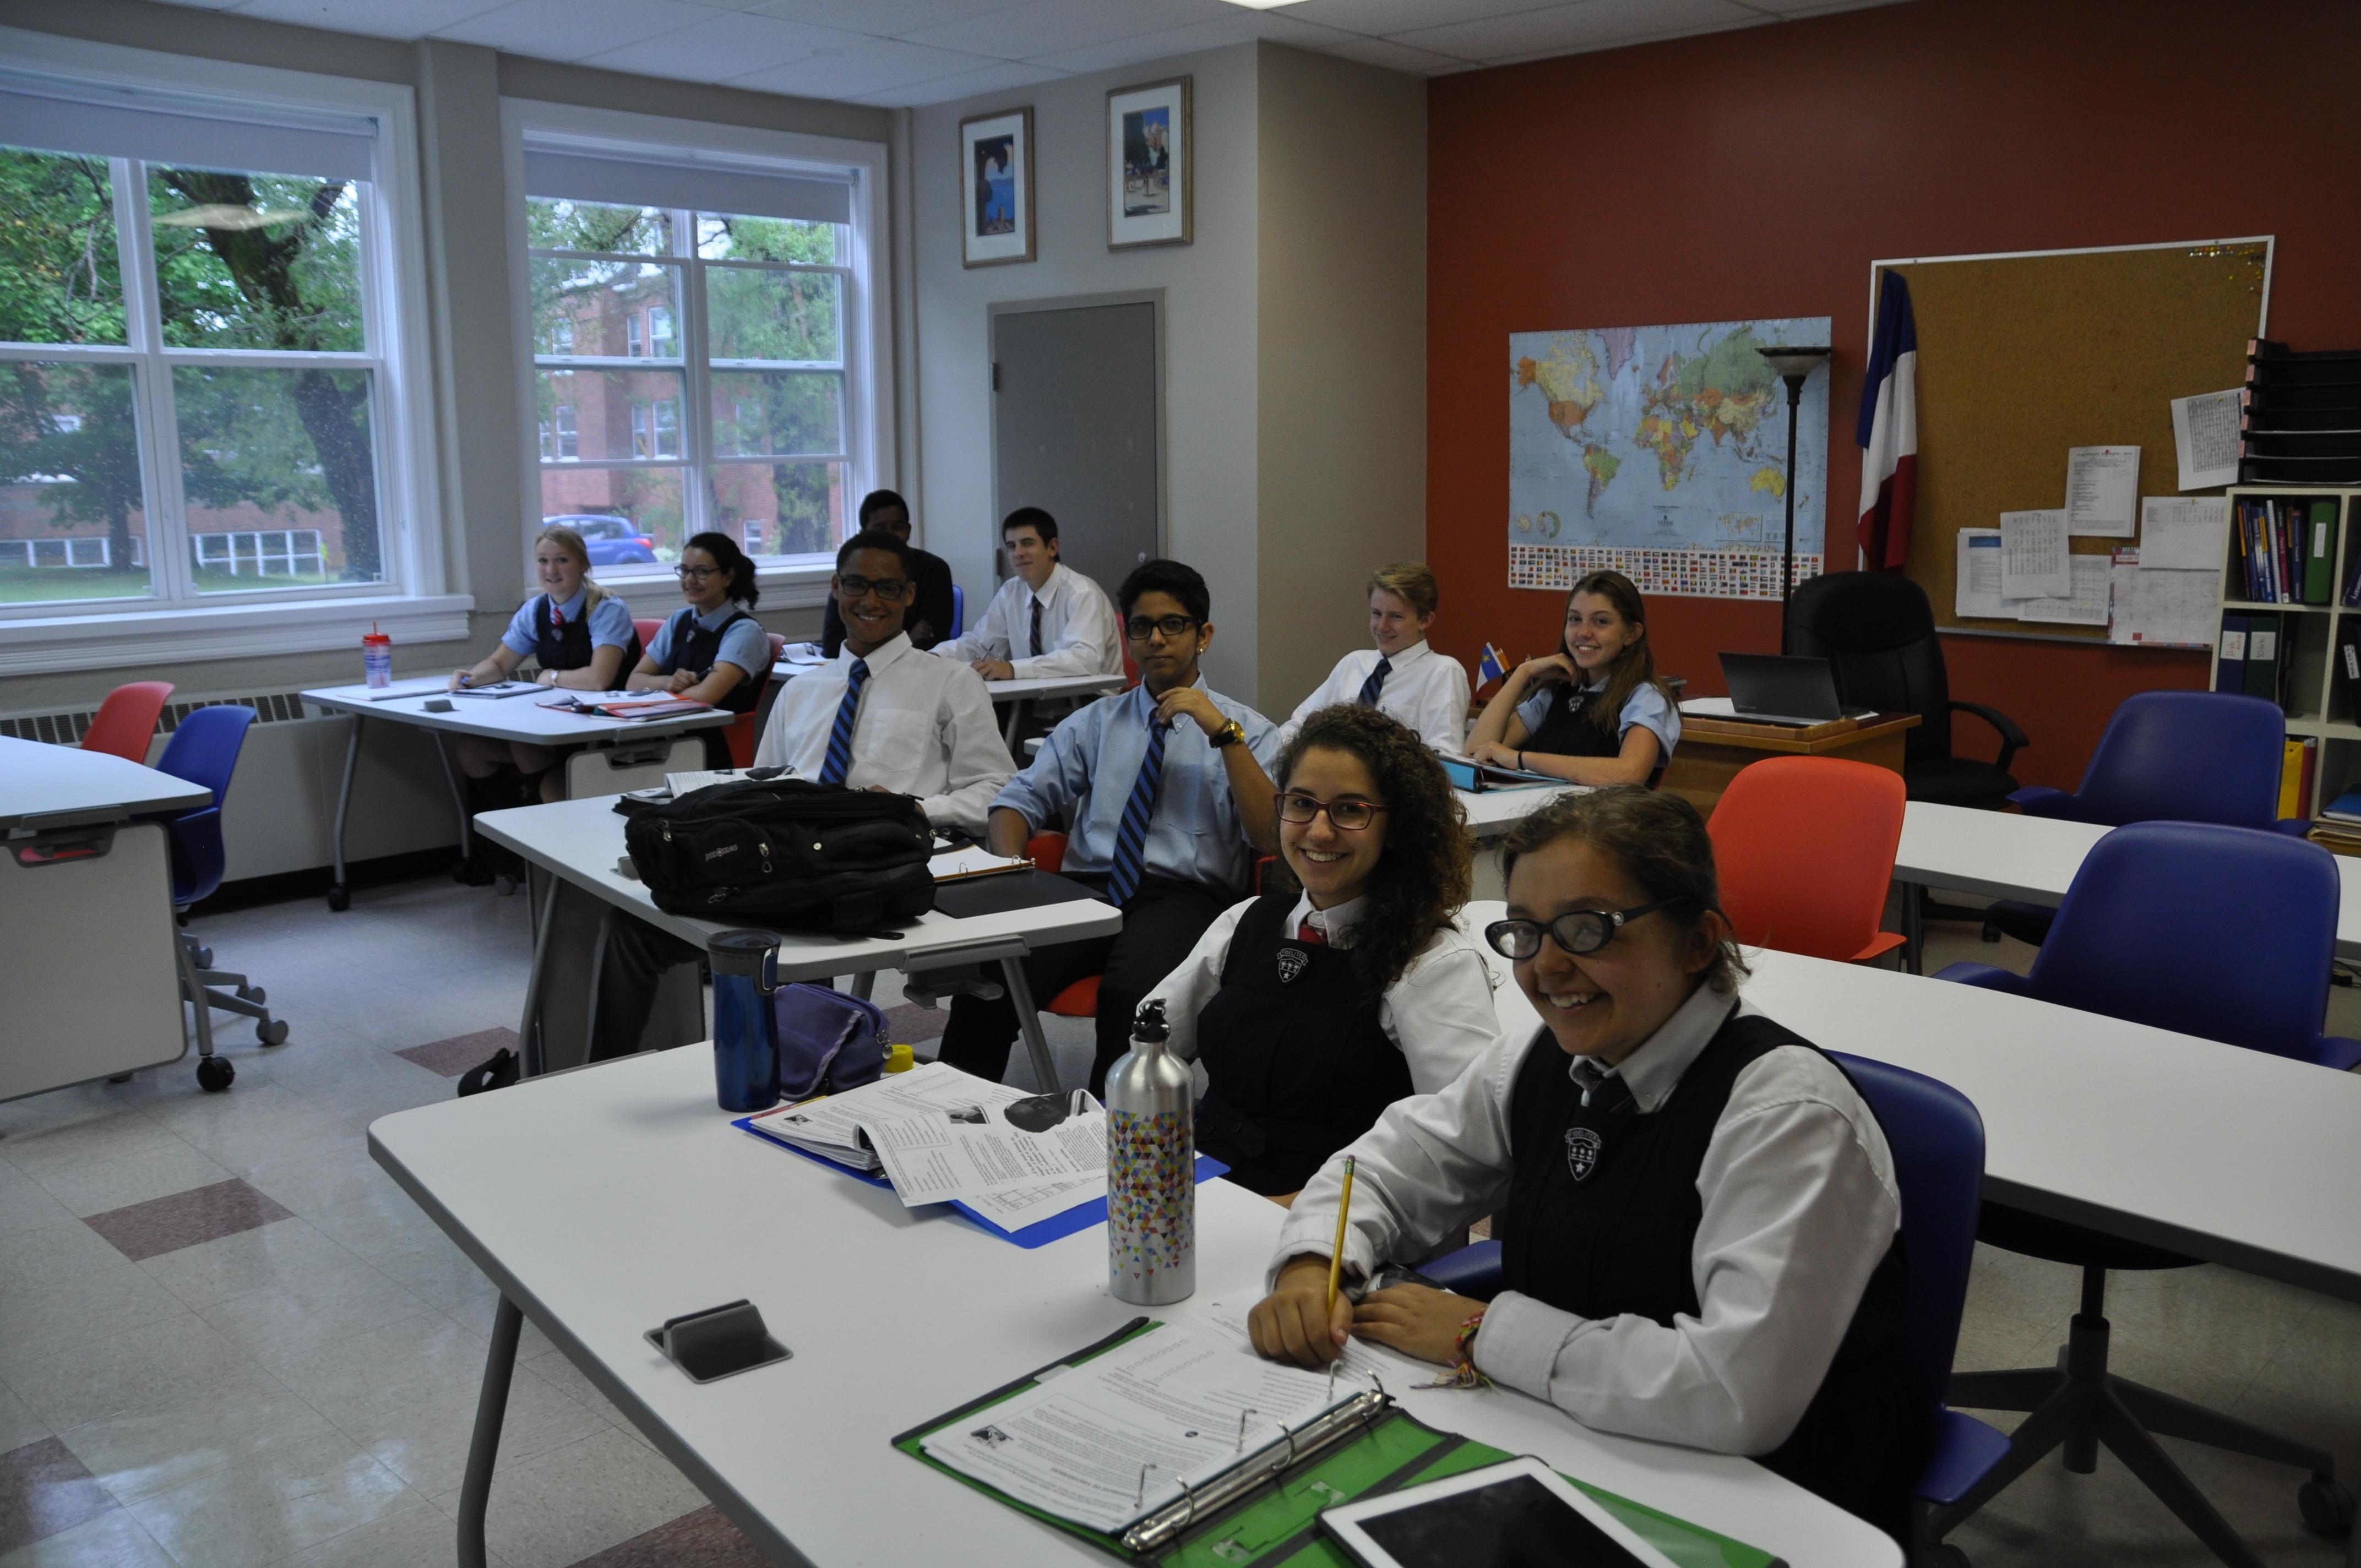 classrooms_4.jpg